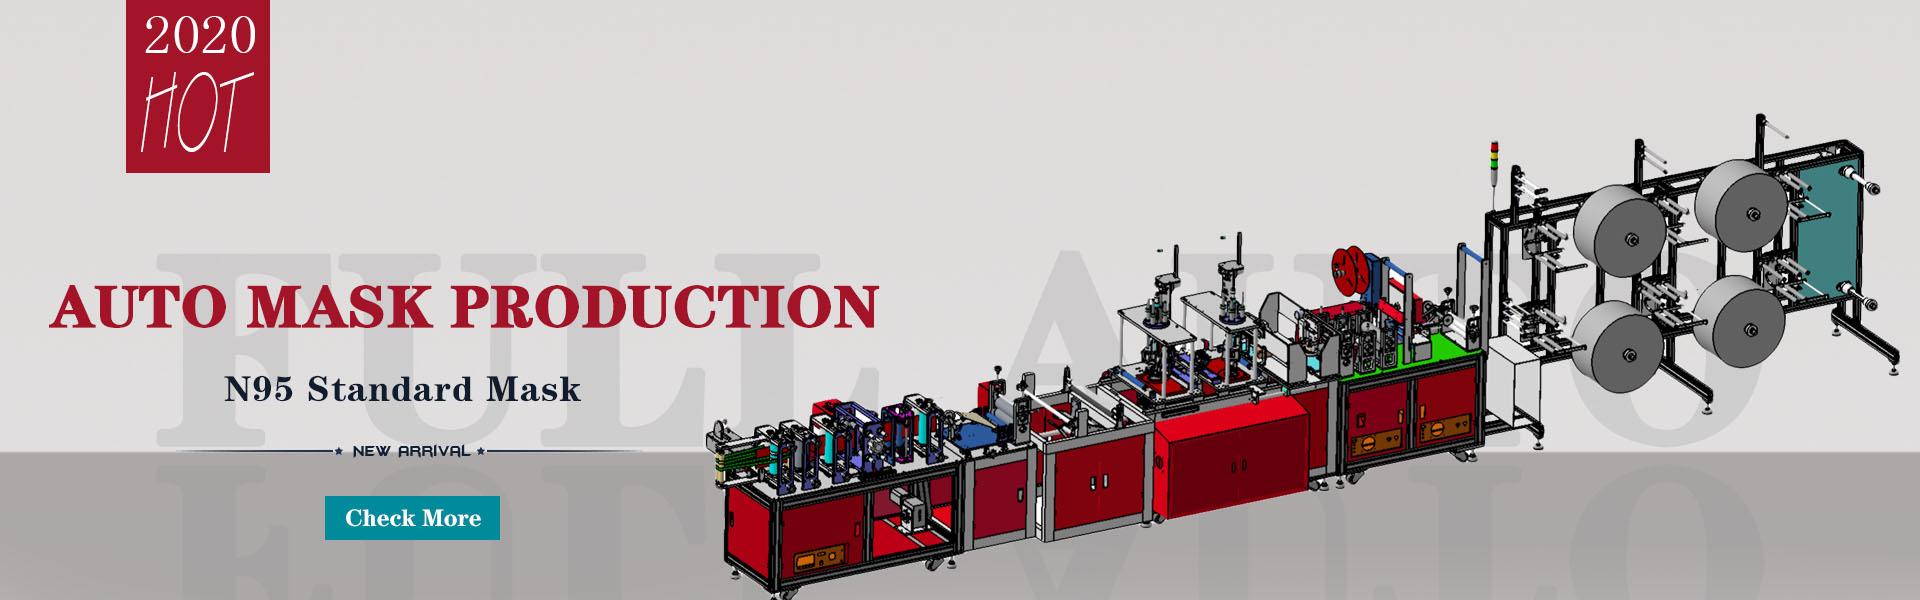 N95 mask production line